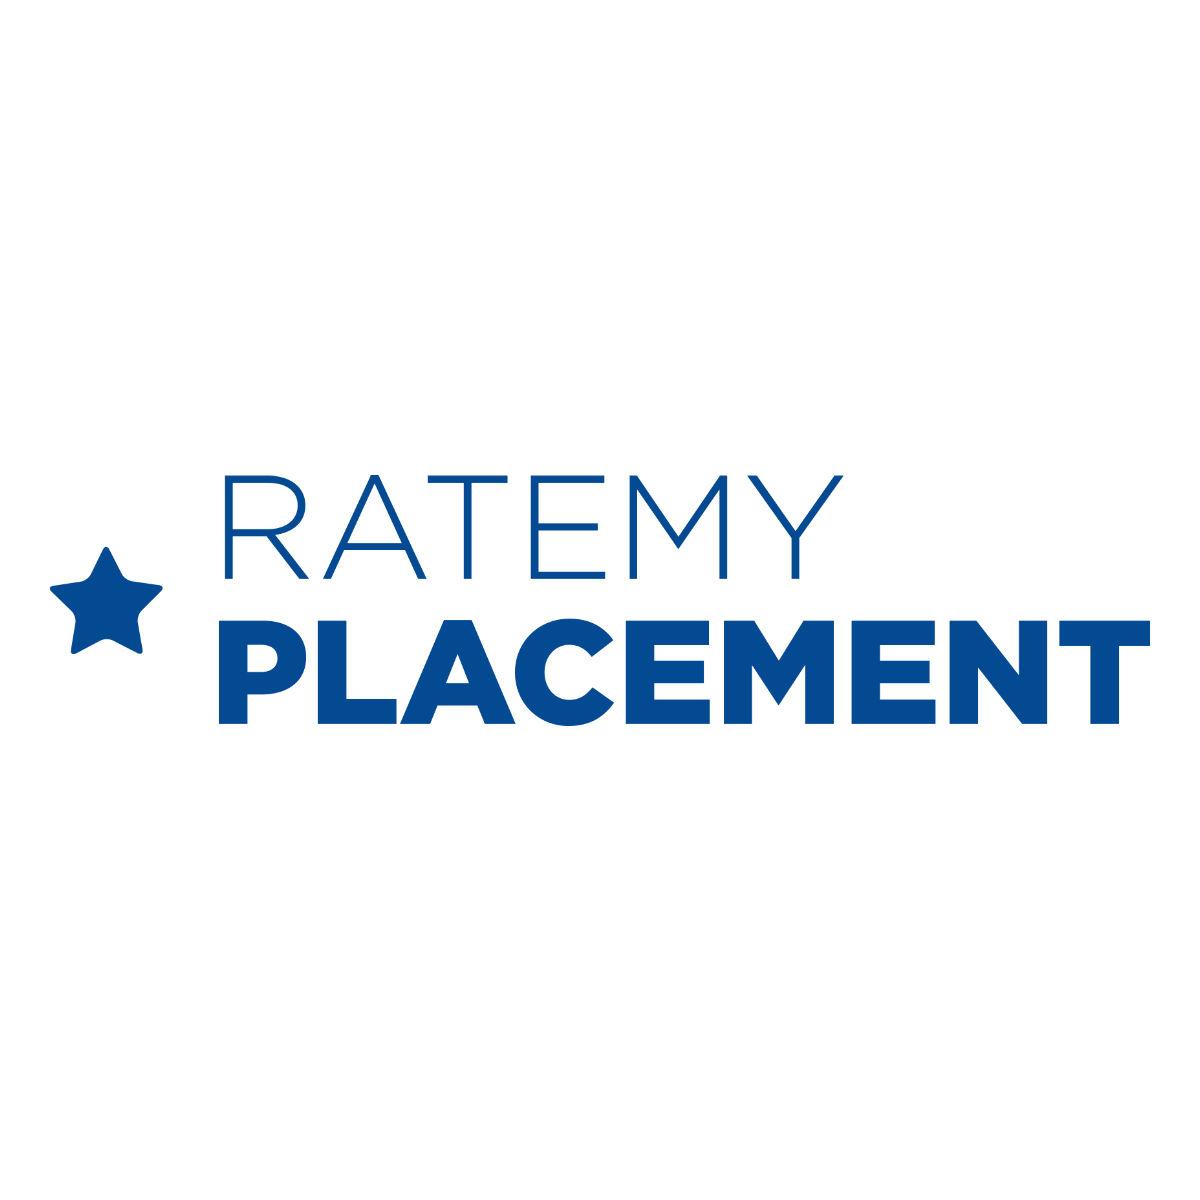 Top Undergraduate Placement & Internship Employers Guide 2018/19